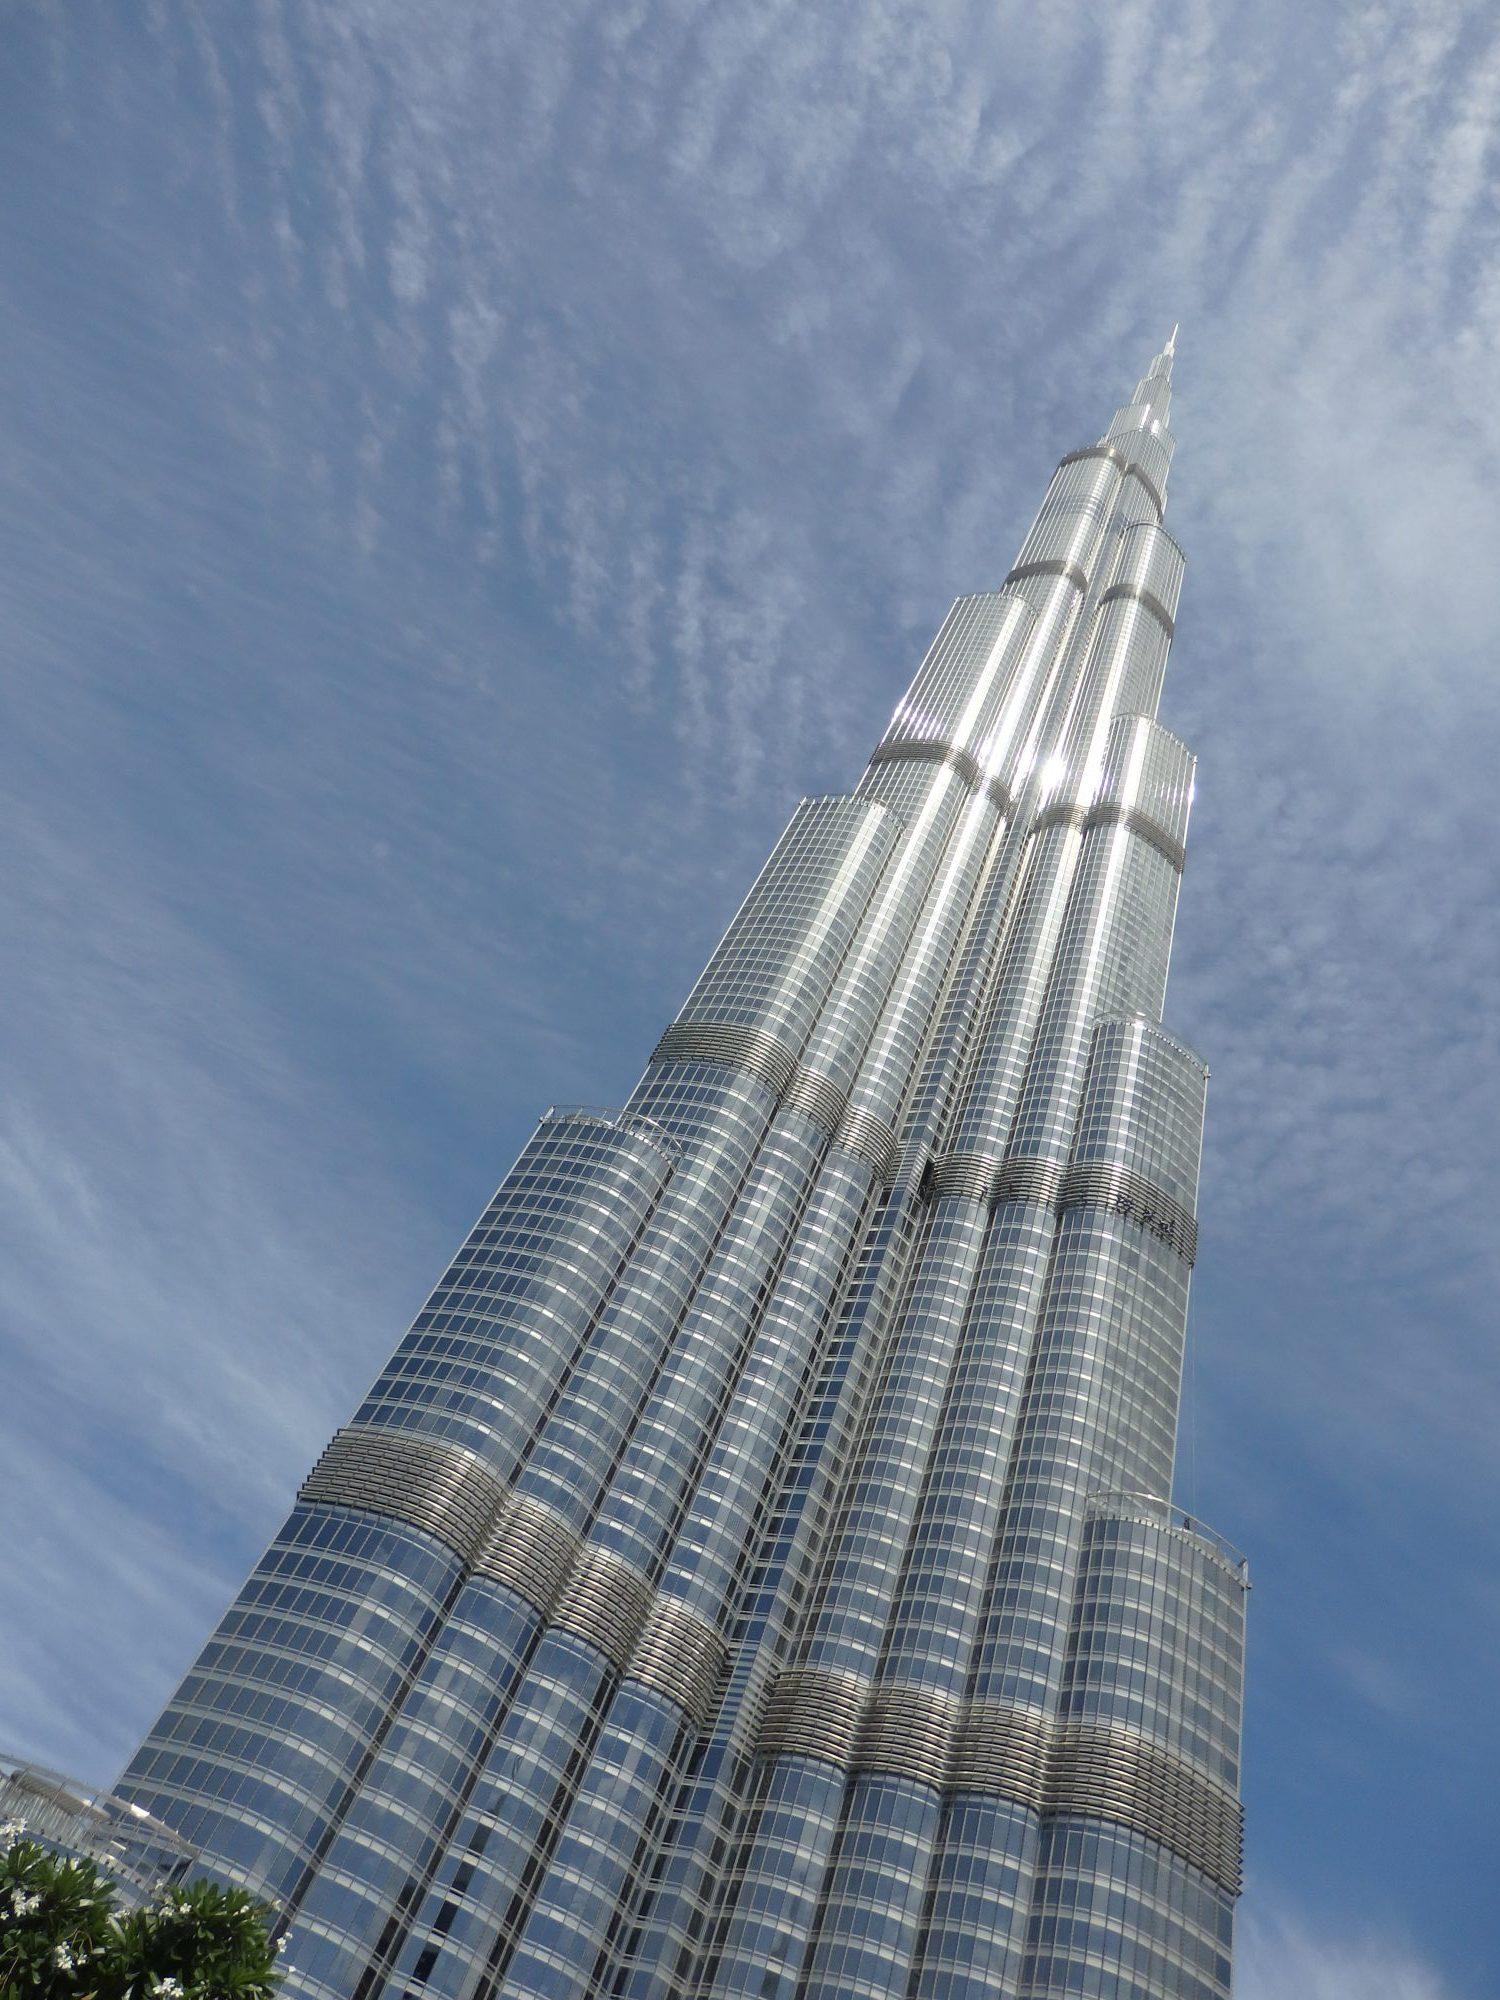 looking up at the Burj Khalifa in Dubai